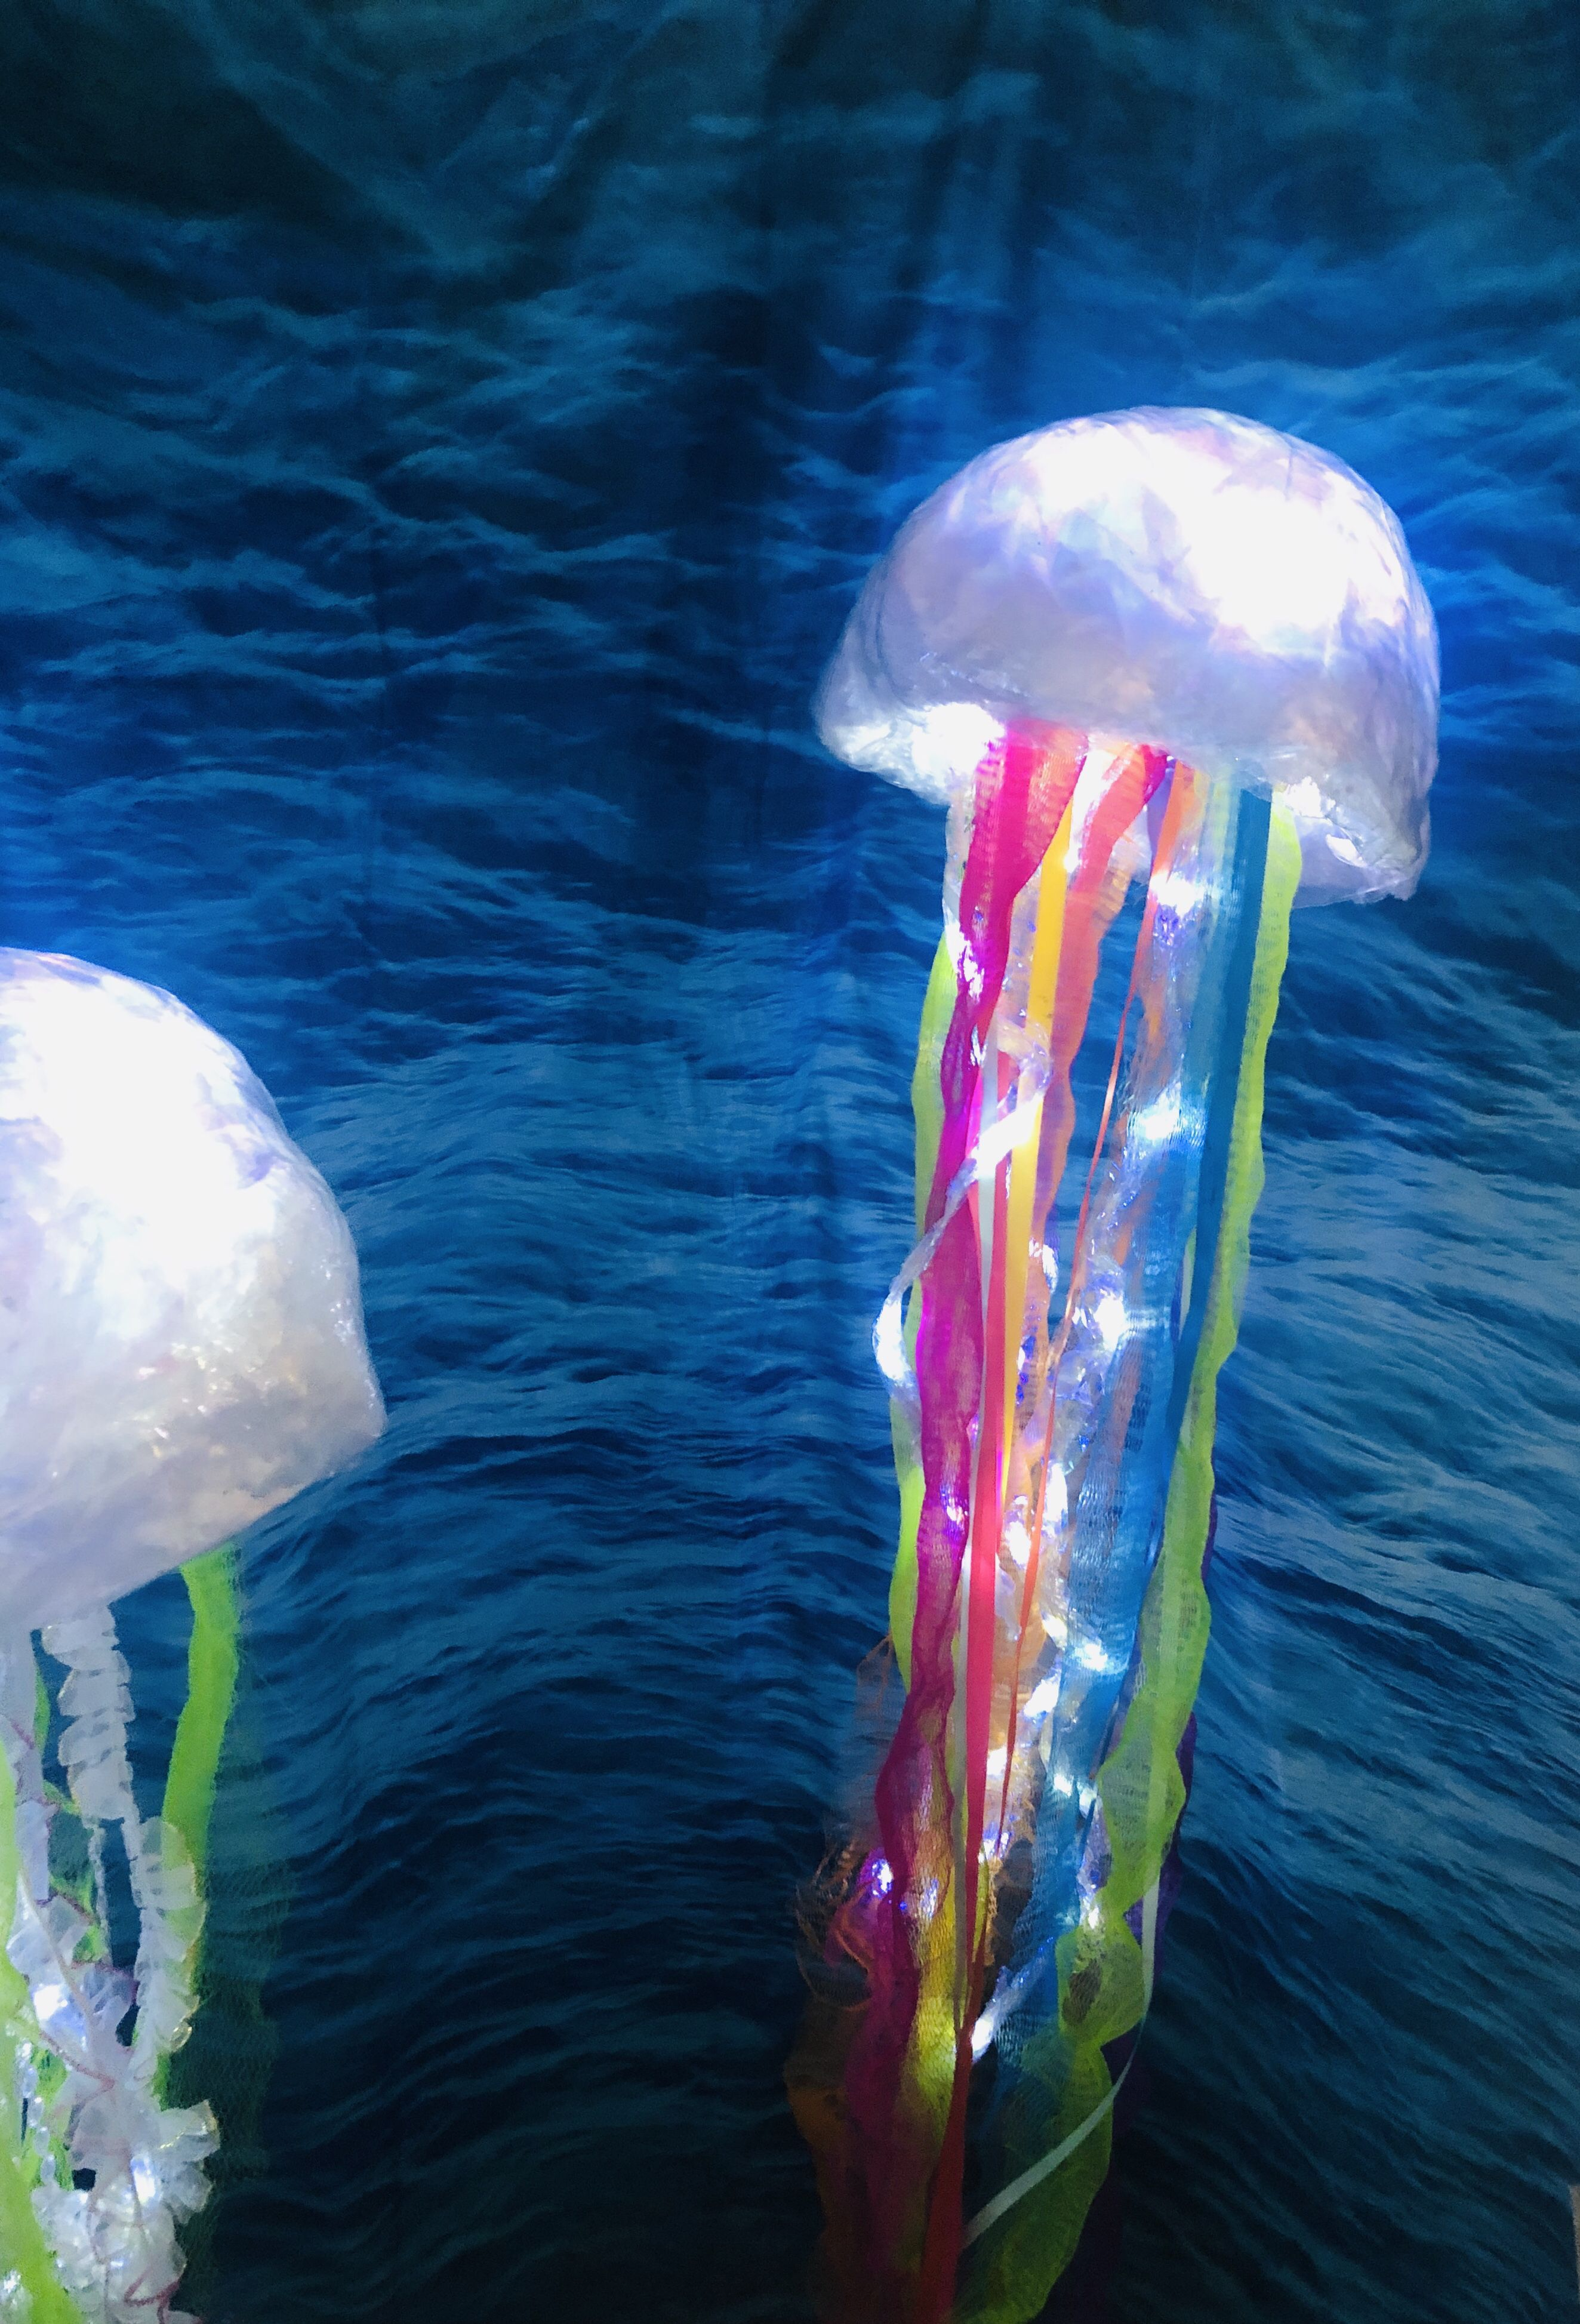 Rainbow LED light up jellyfish for a mermaid party! Jellyfish lantern#jellyfish #lantern #led #light #mermaid #party #rainbow